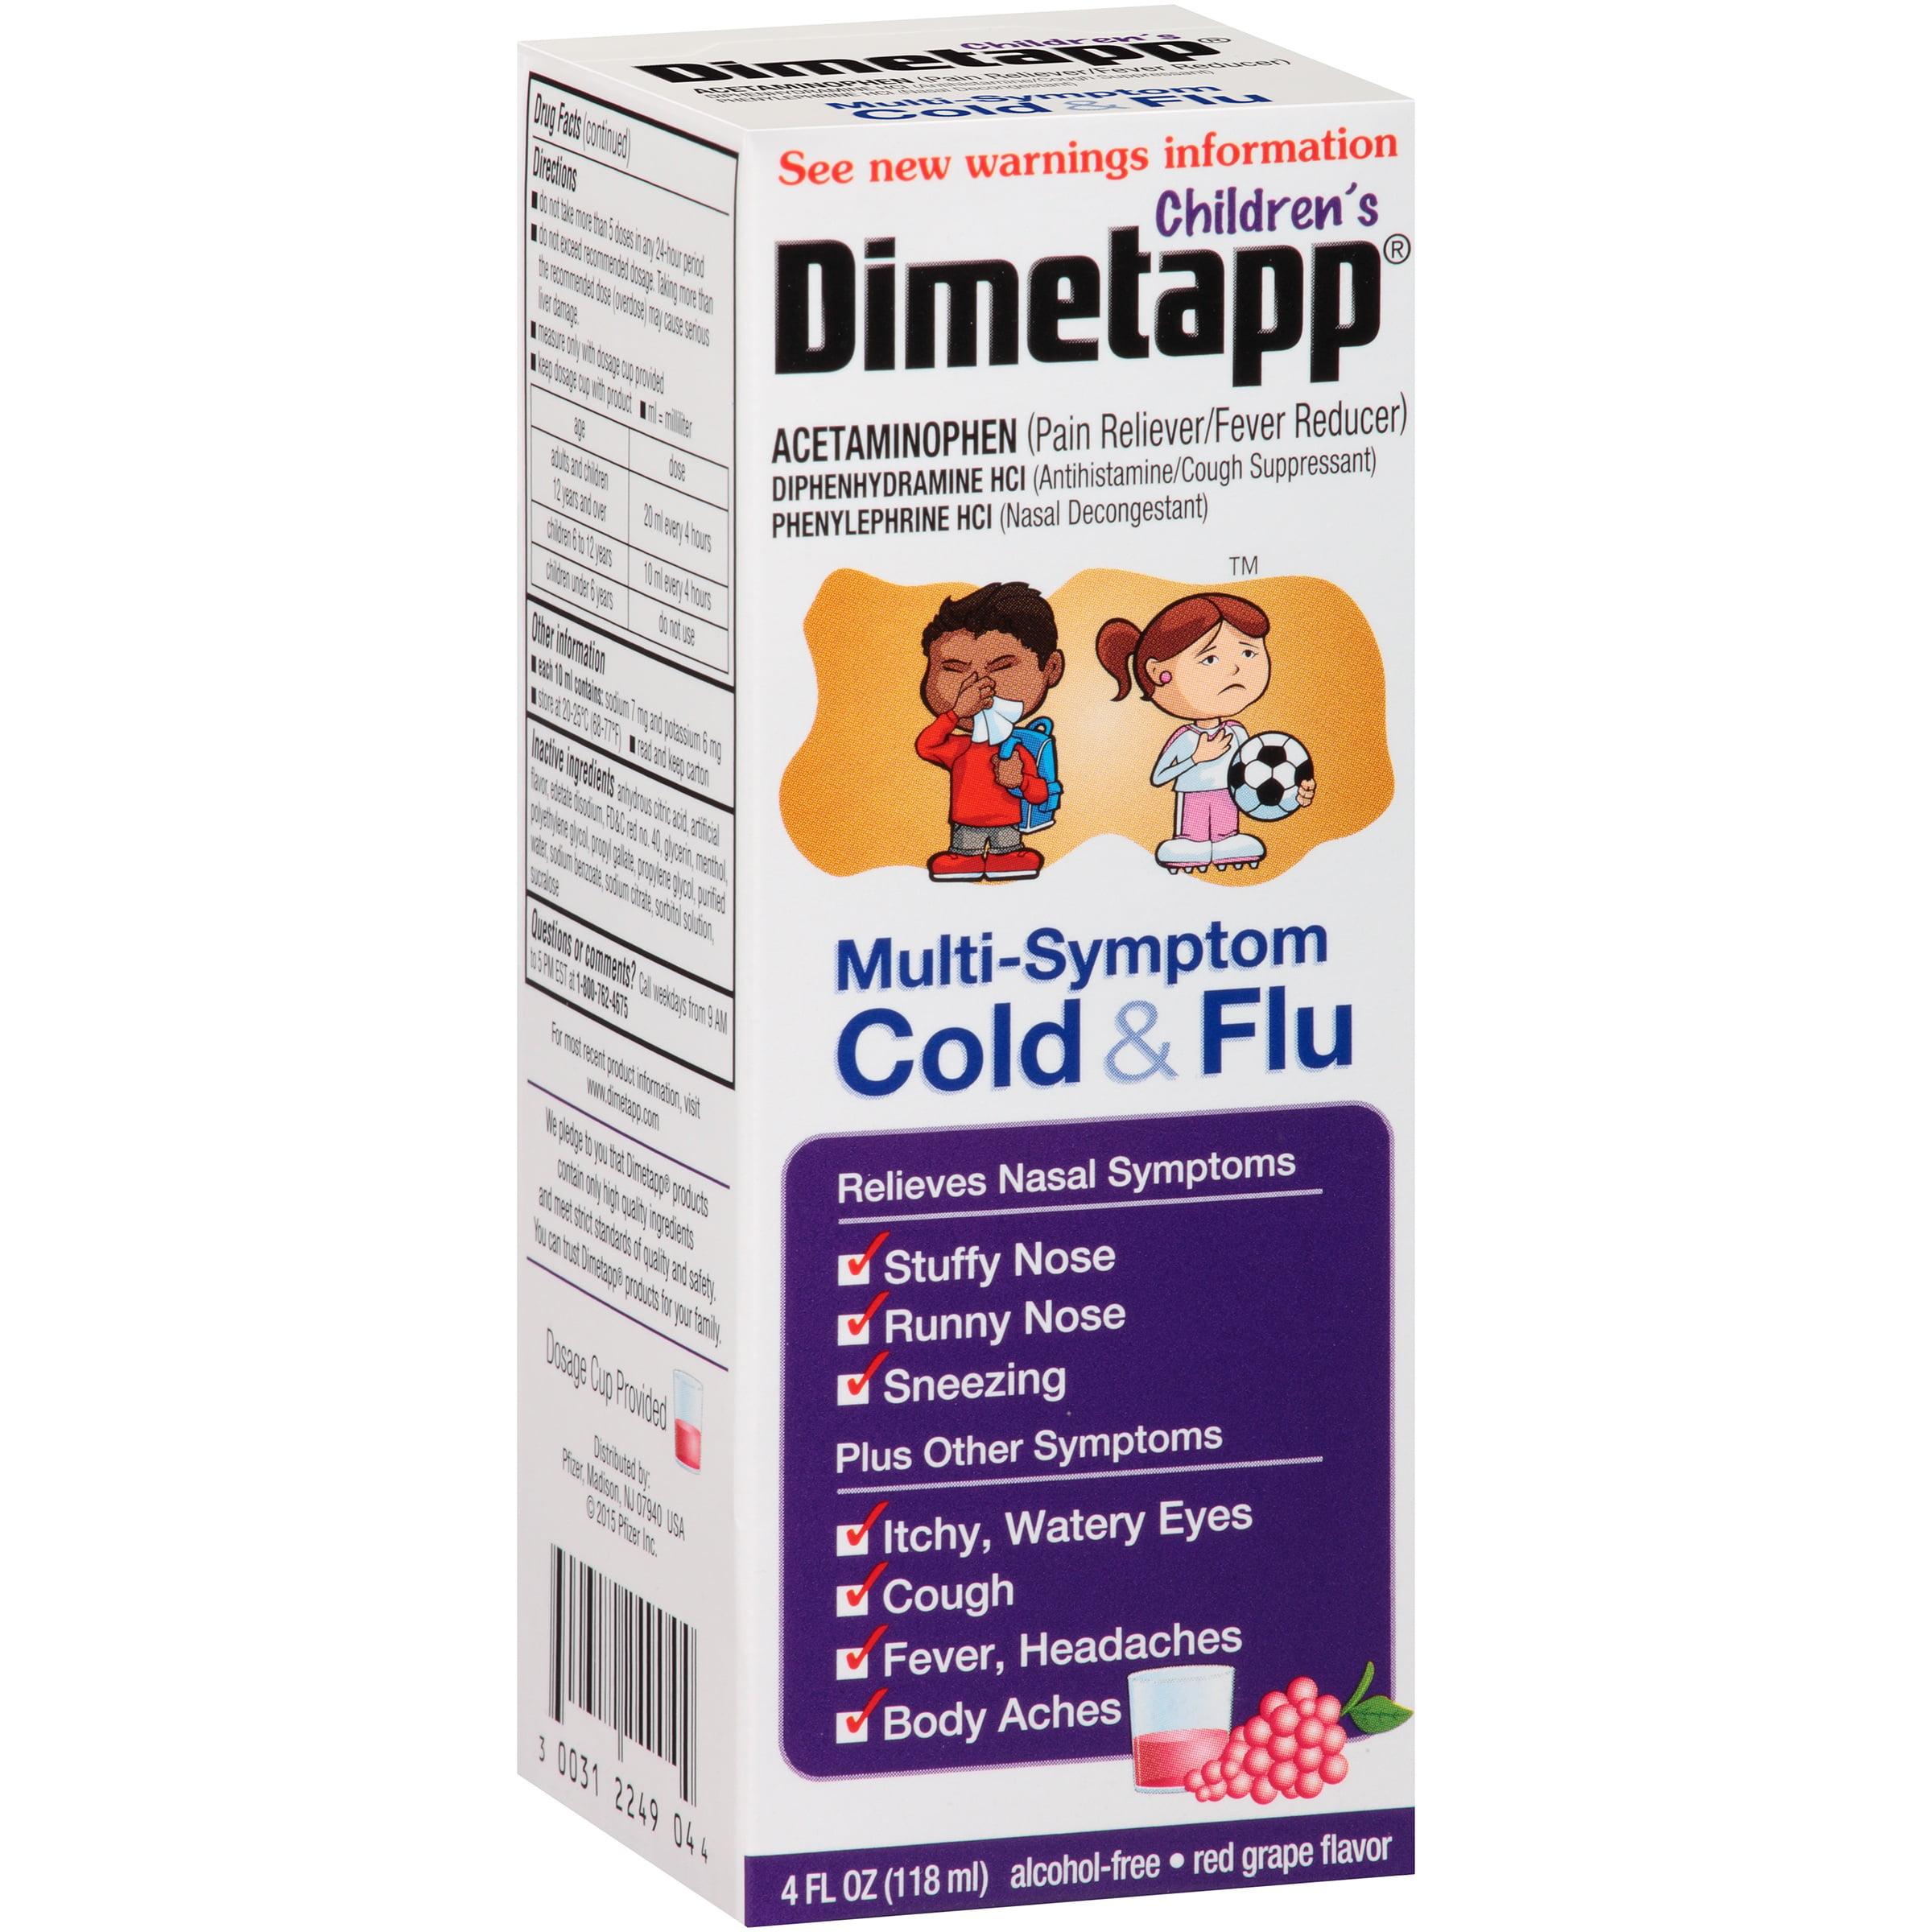 Dimetapp Children's Multi-Symptom Cold & Flu Red Grape Flavor, 4.0 FL OZ